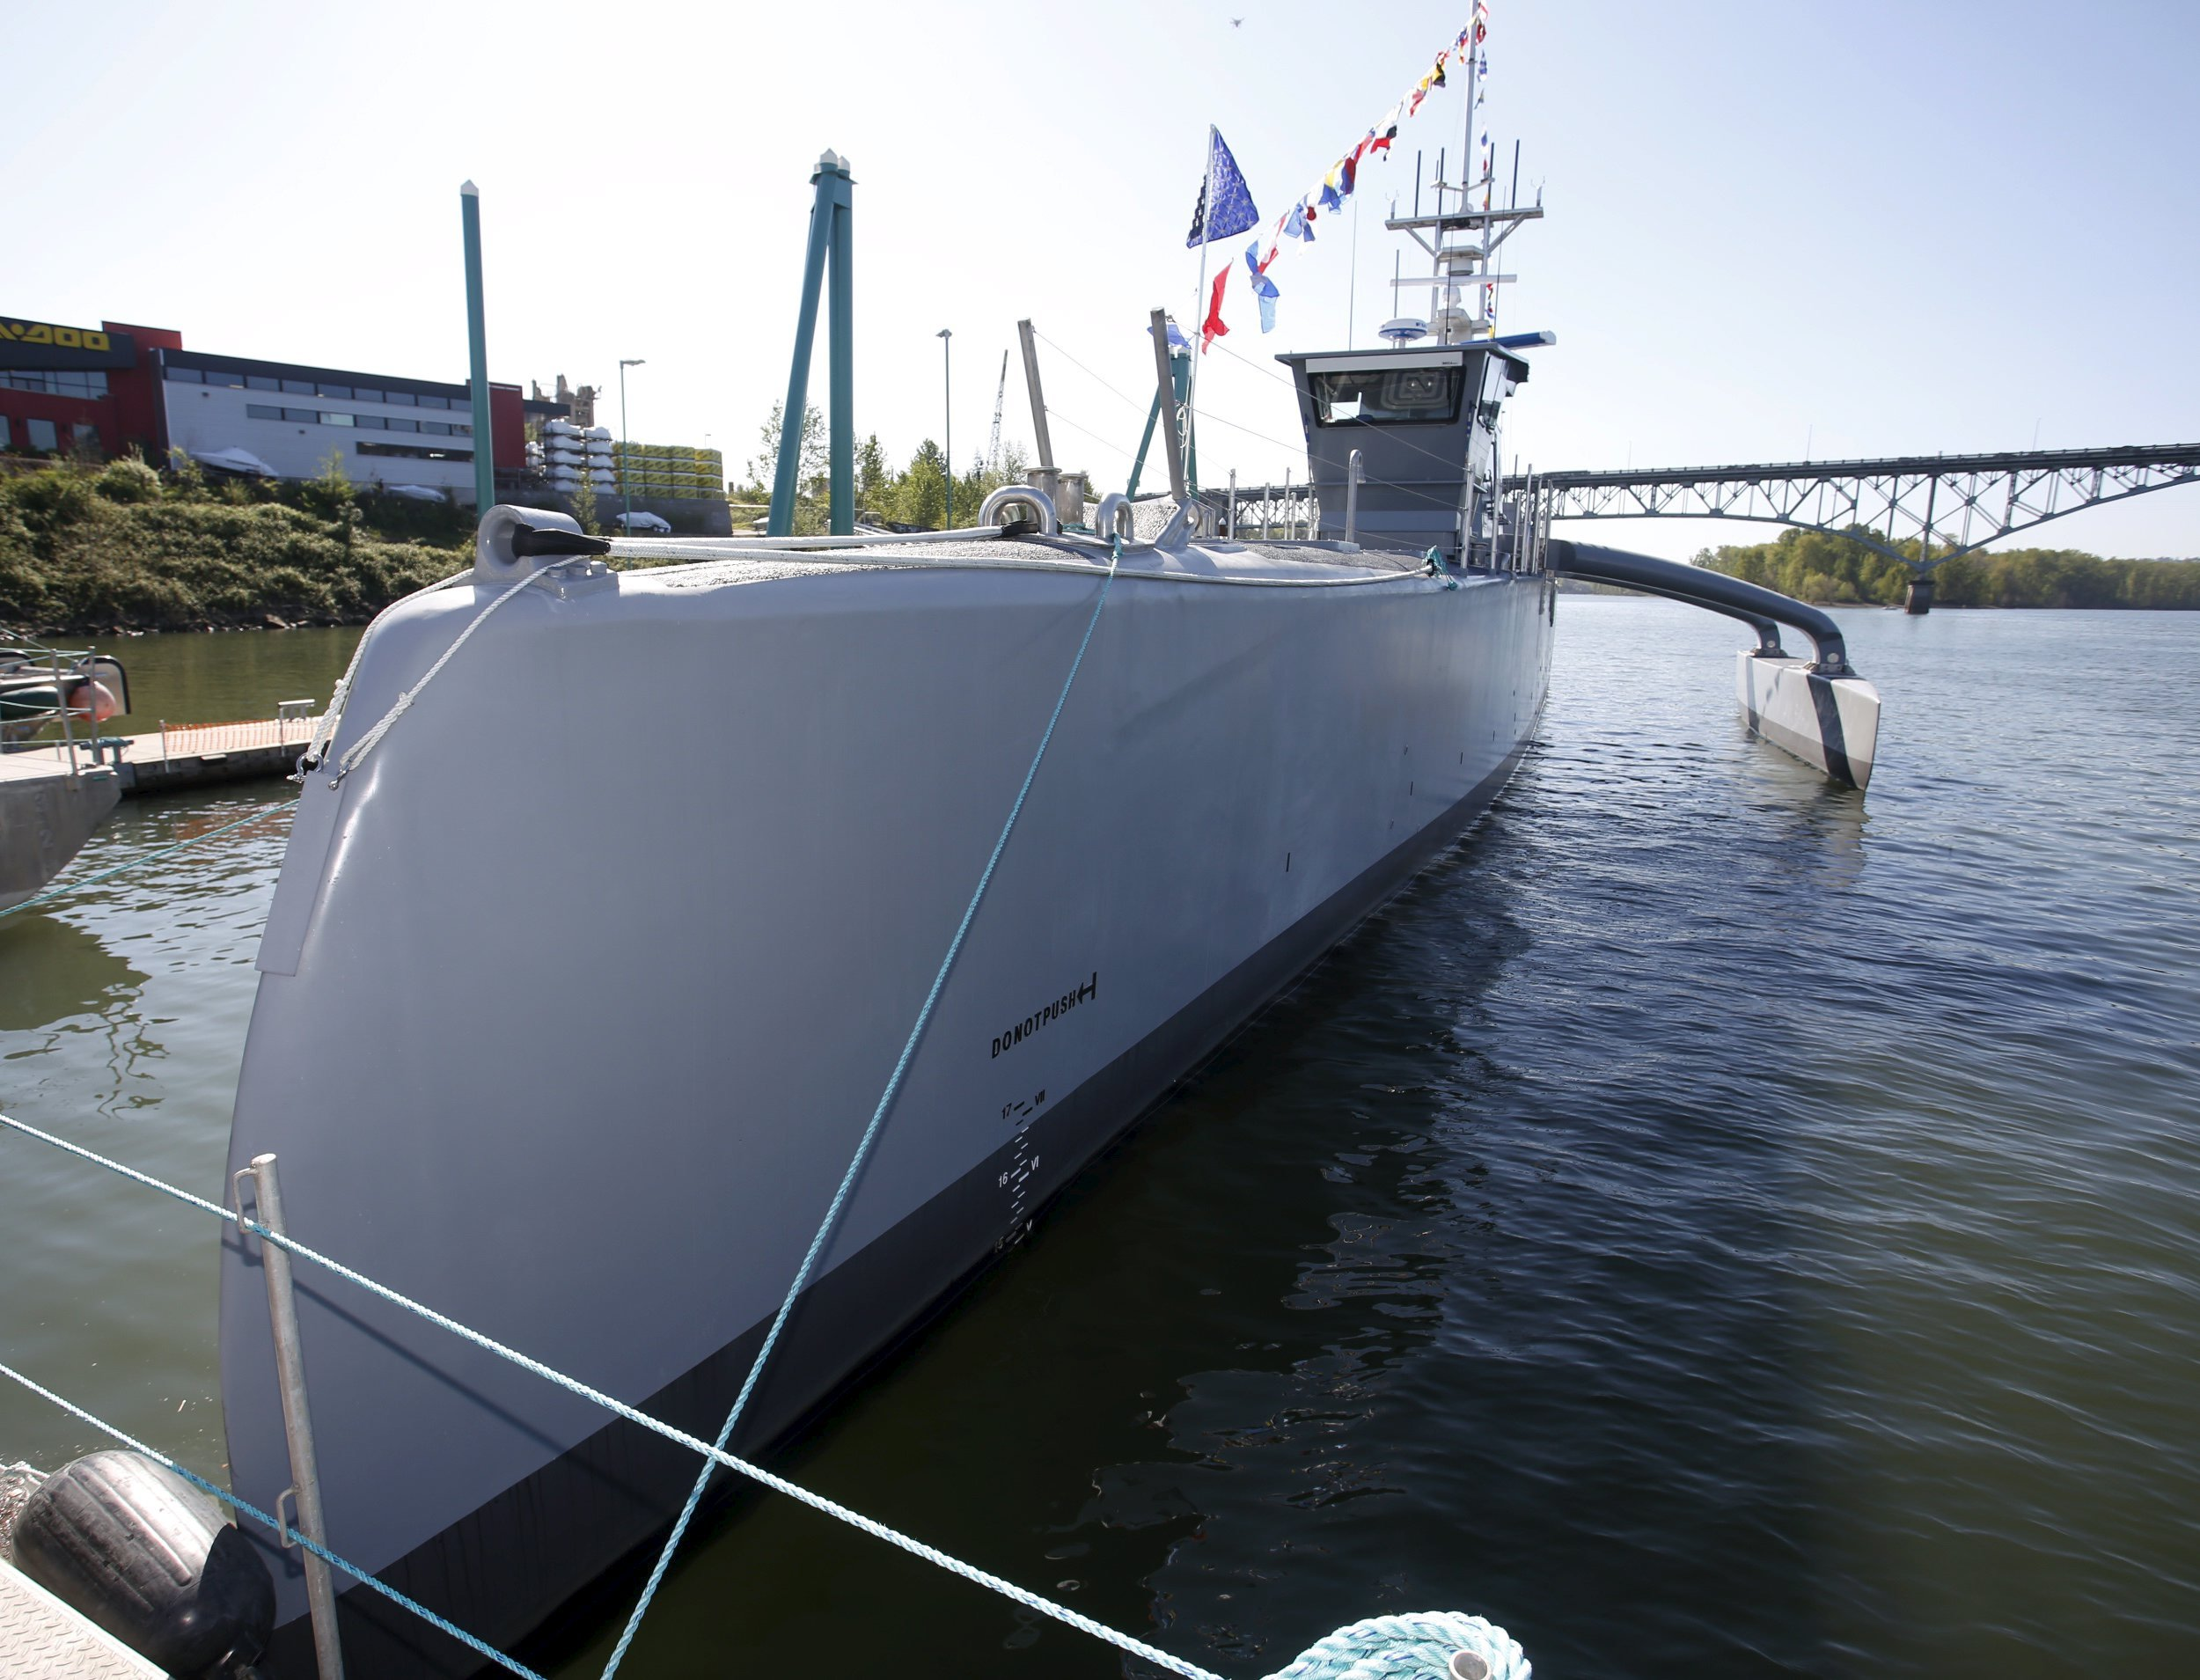 sea_hunter_darpa_warship_0408